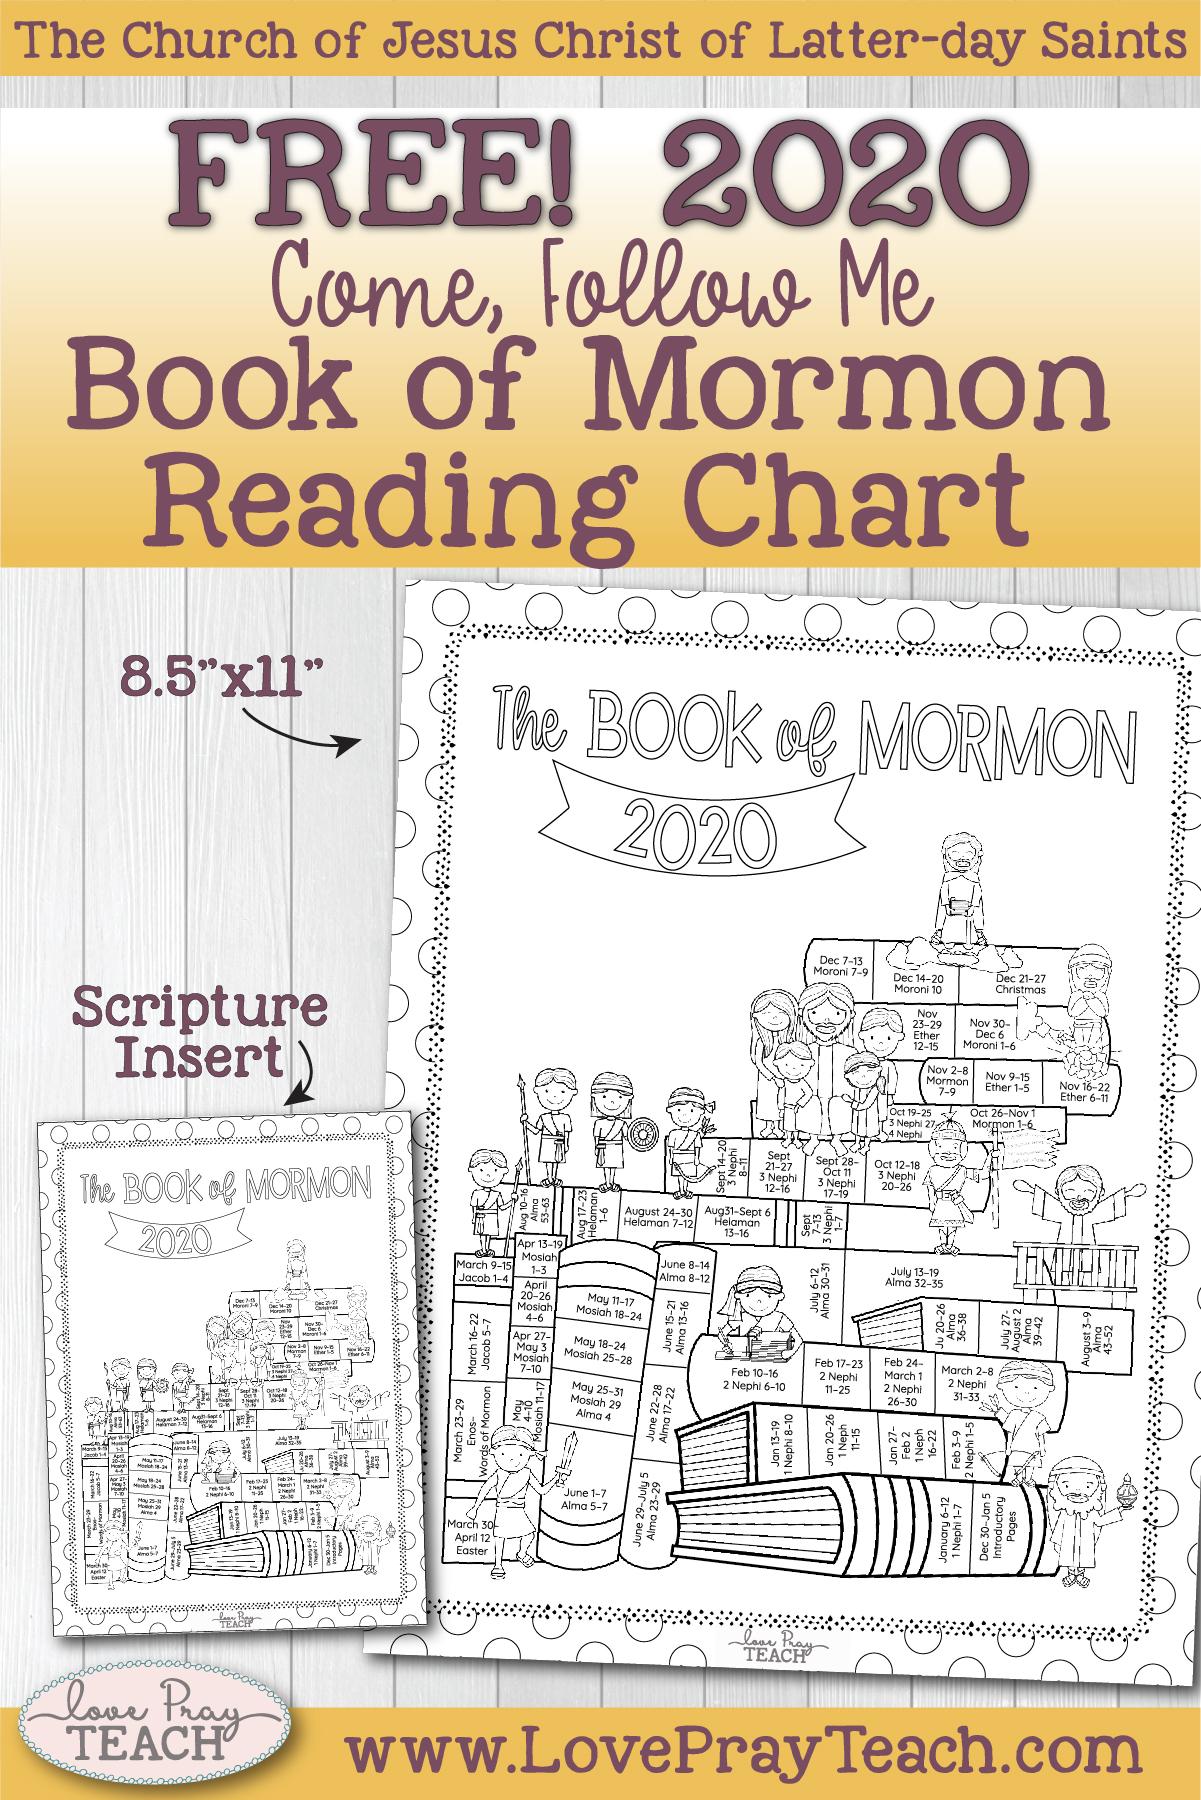 Free Come Follow Me Book Of Mormon Reading Chart